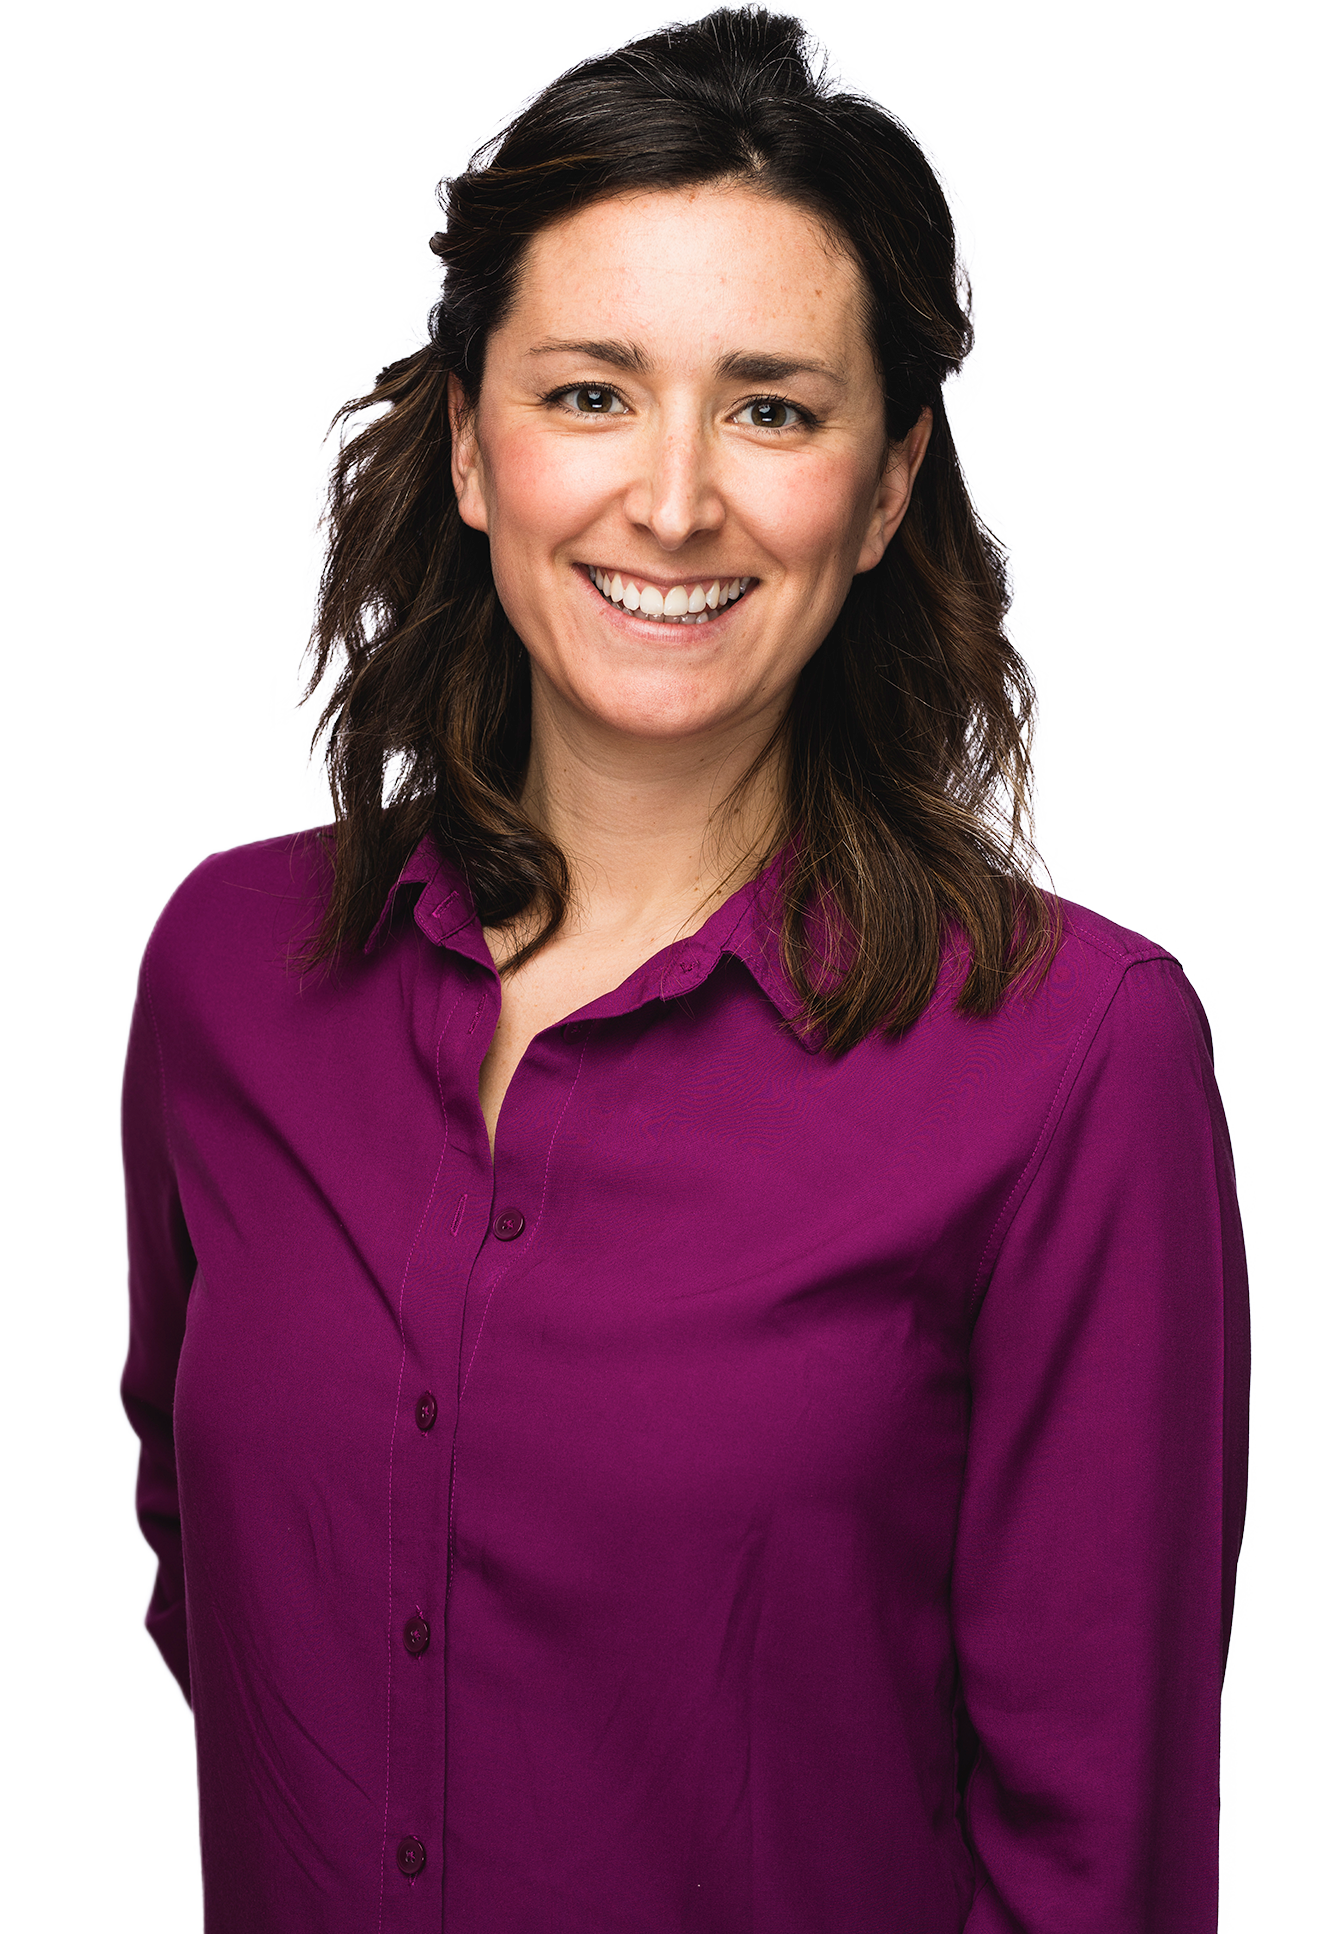 Portrait of Leah Coglin